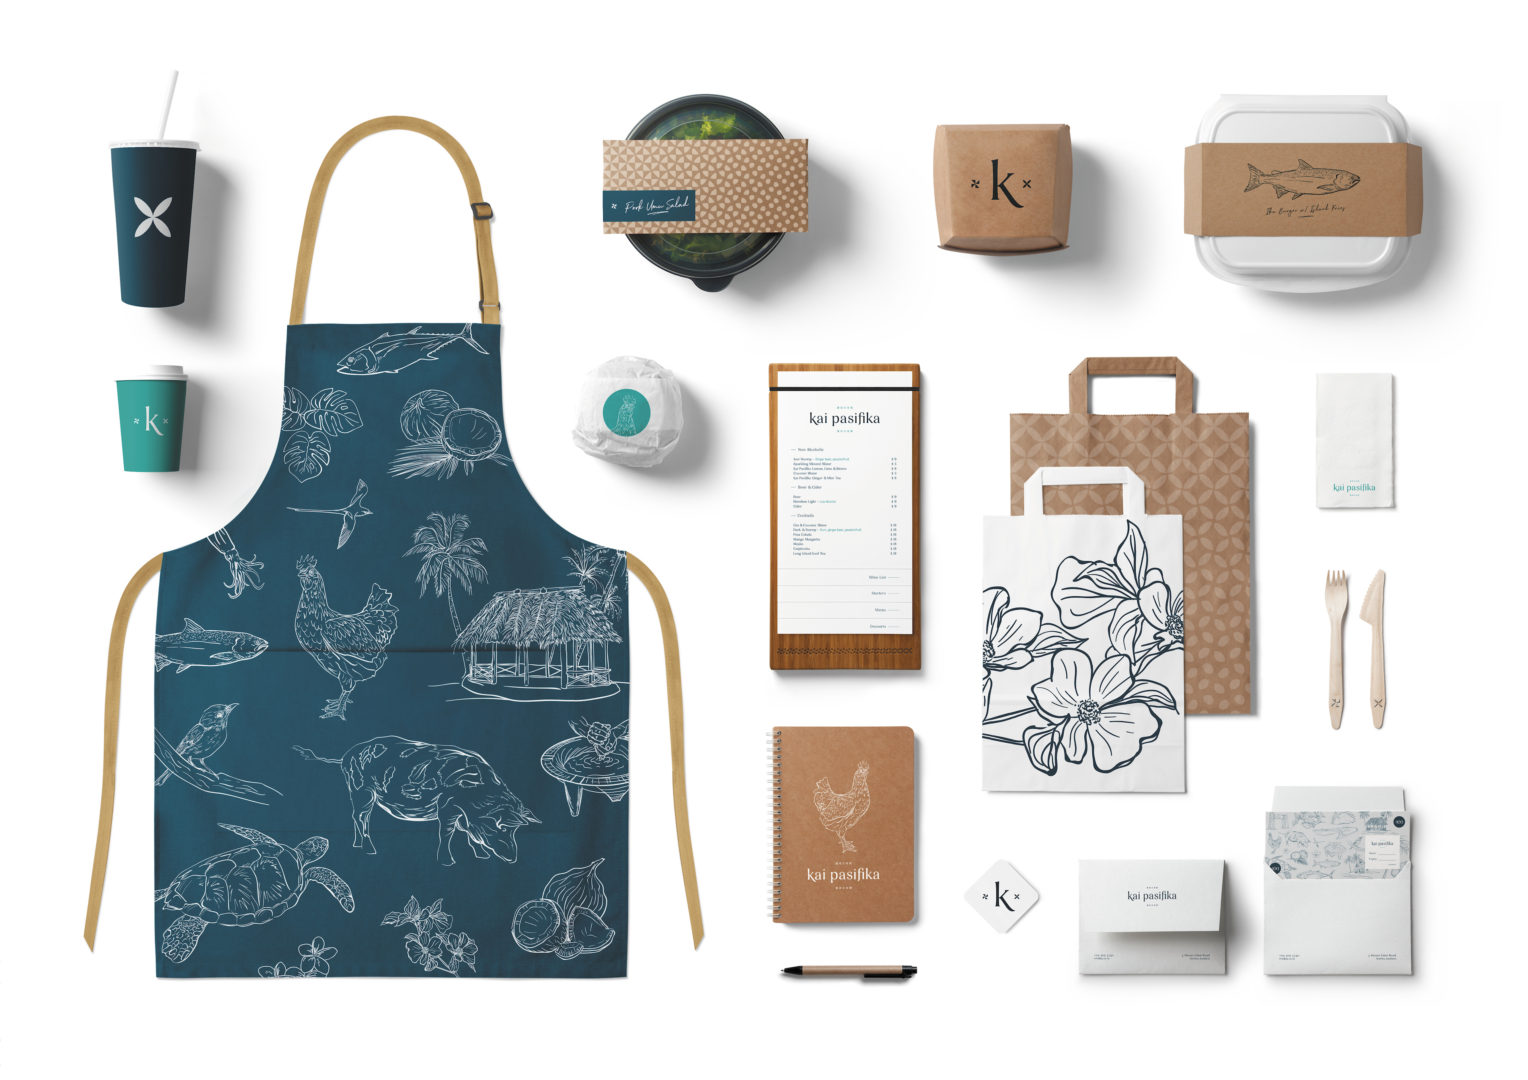 Kai Pasifika packaging uniform takeaway cup diary pen stickers envelope cutlery